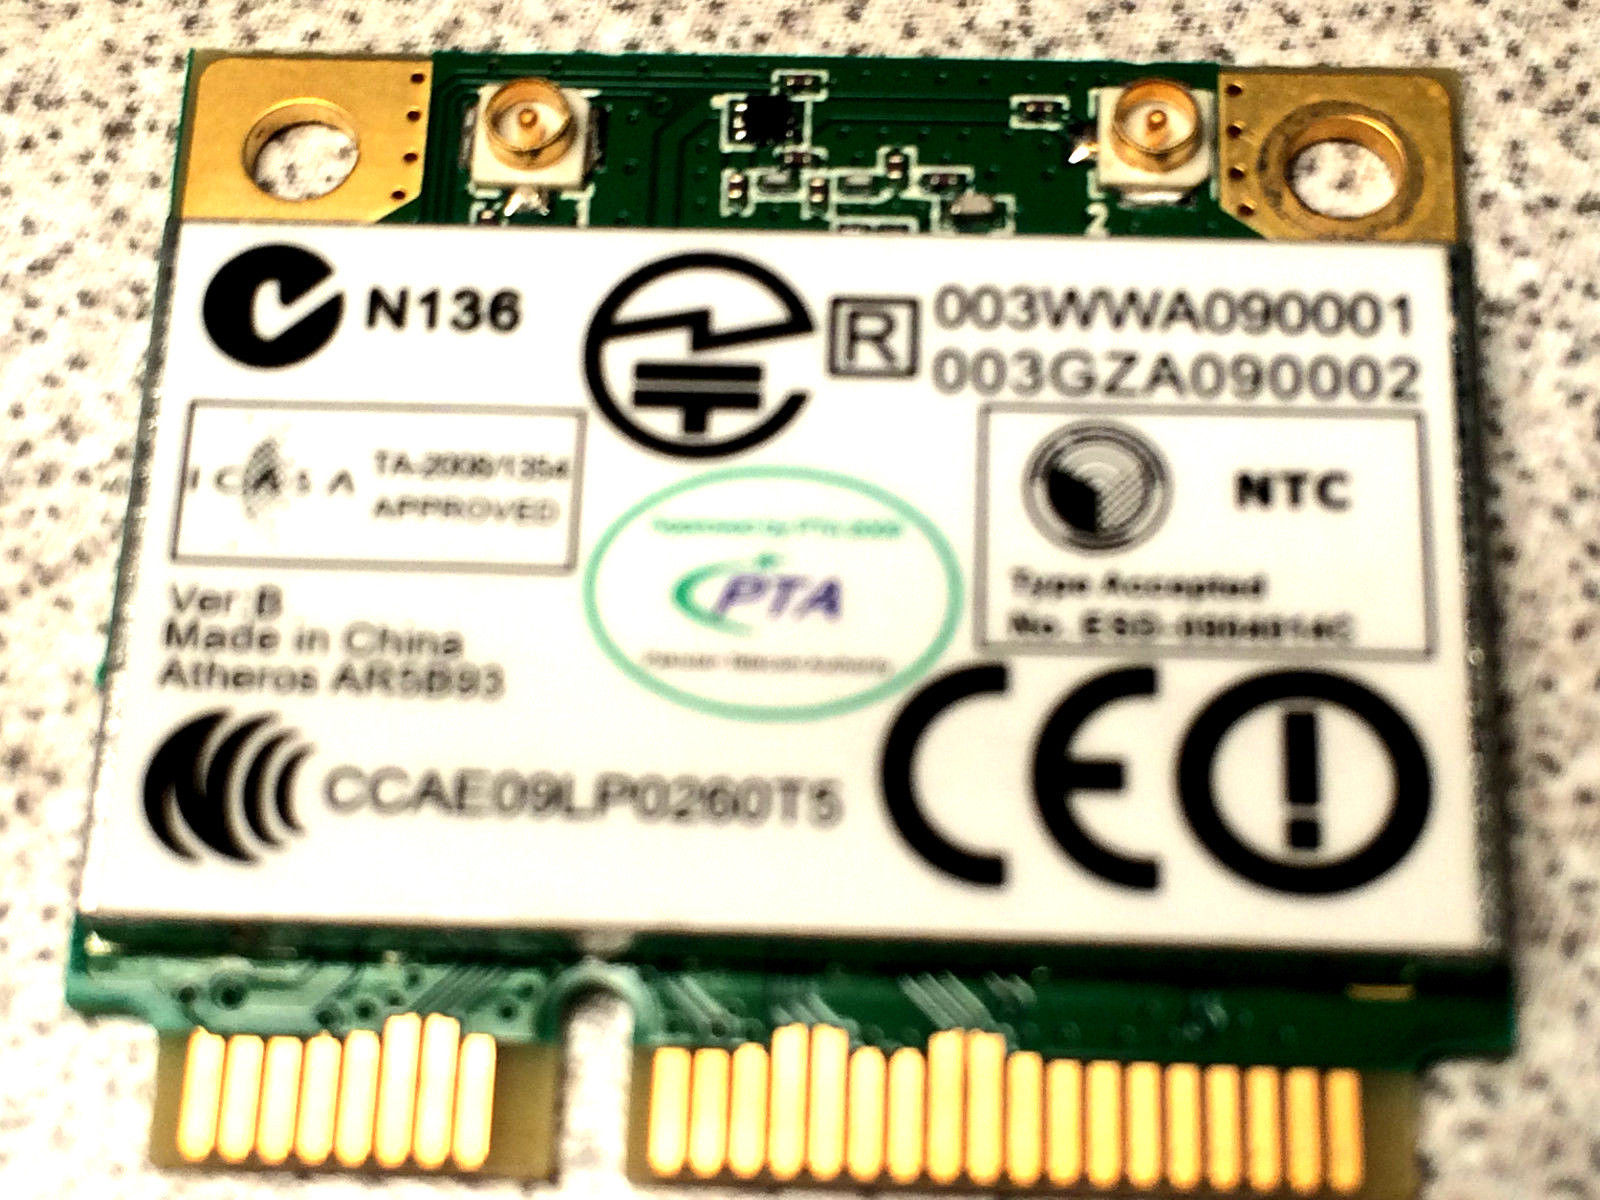 Genuine Acer 5334 Atheros Half Height Wifi Wireless Wlan Mini PCI-E Card AR5B93